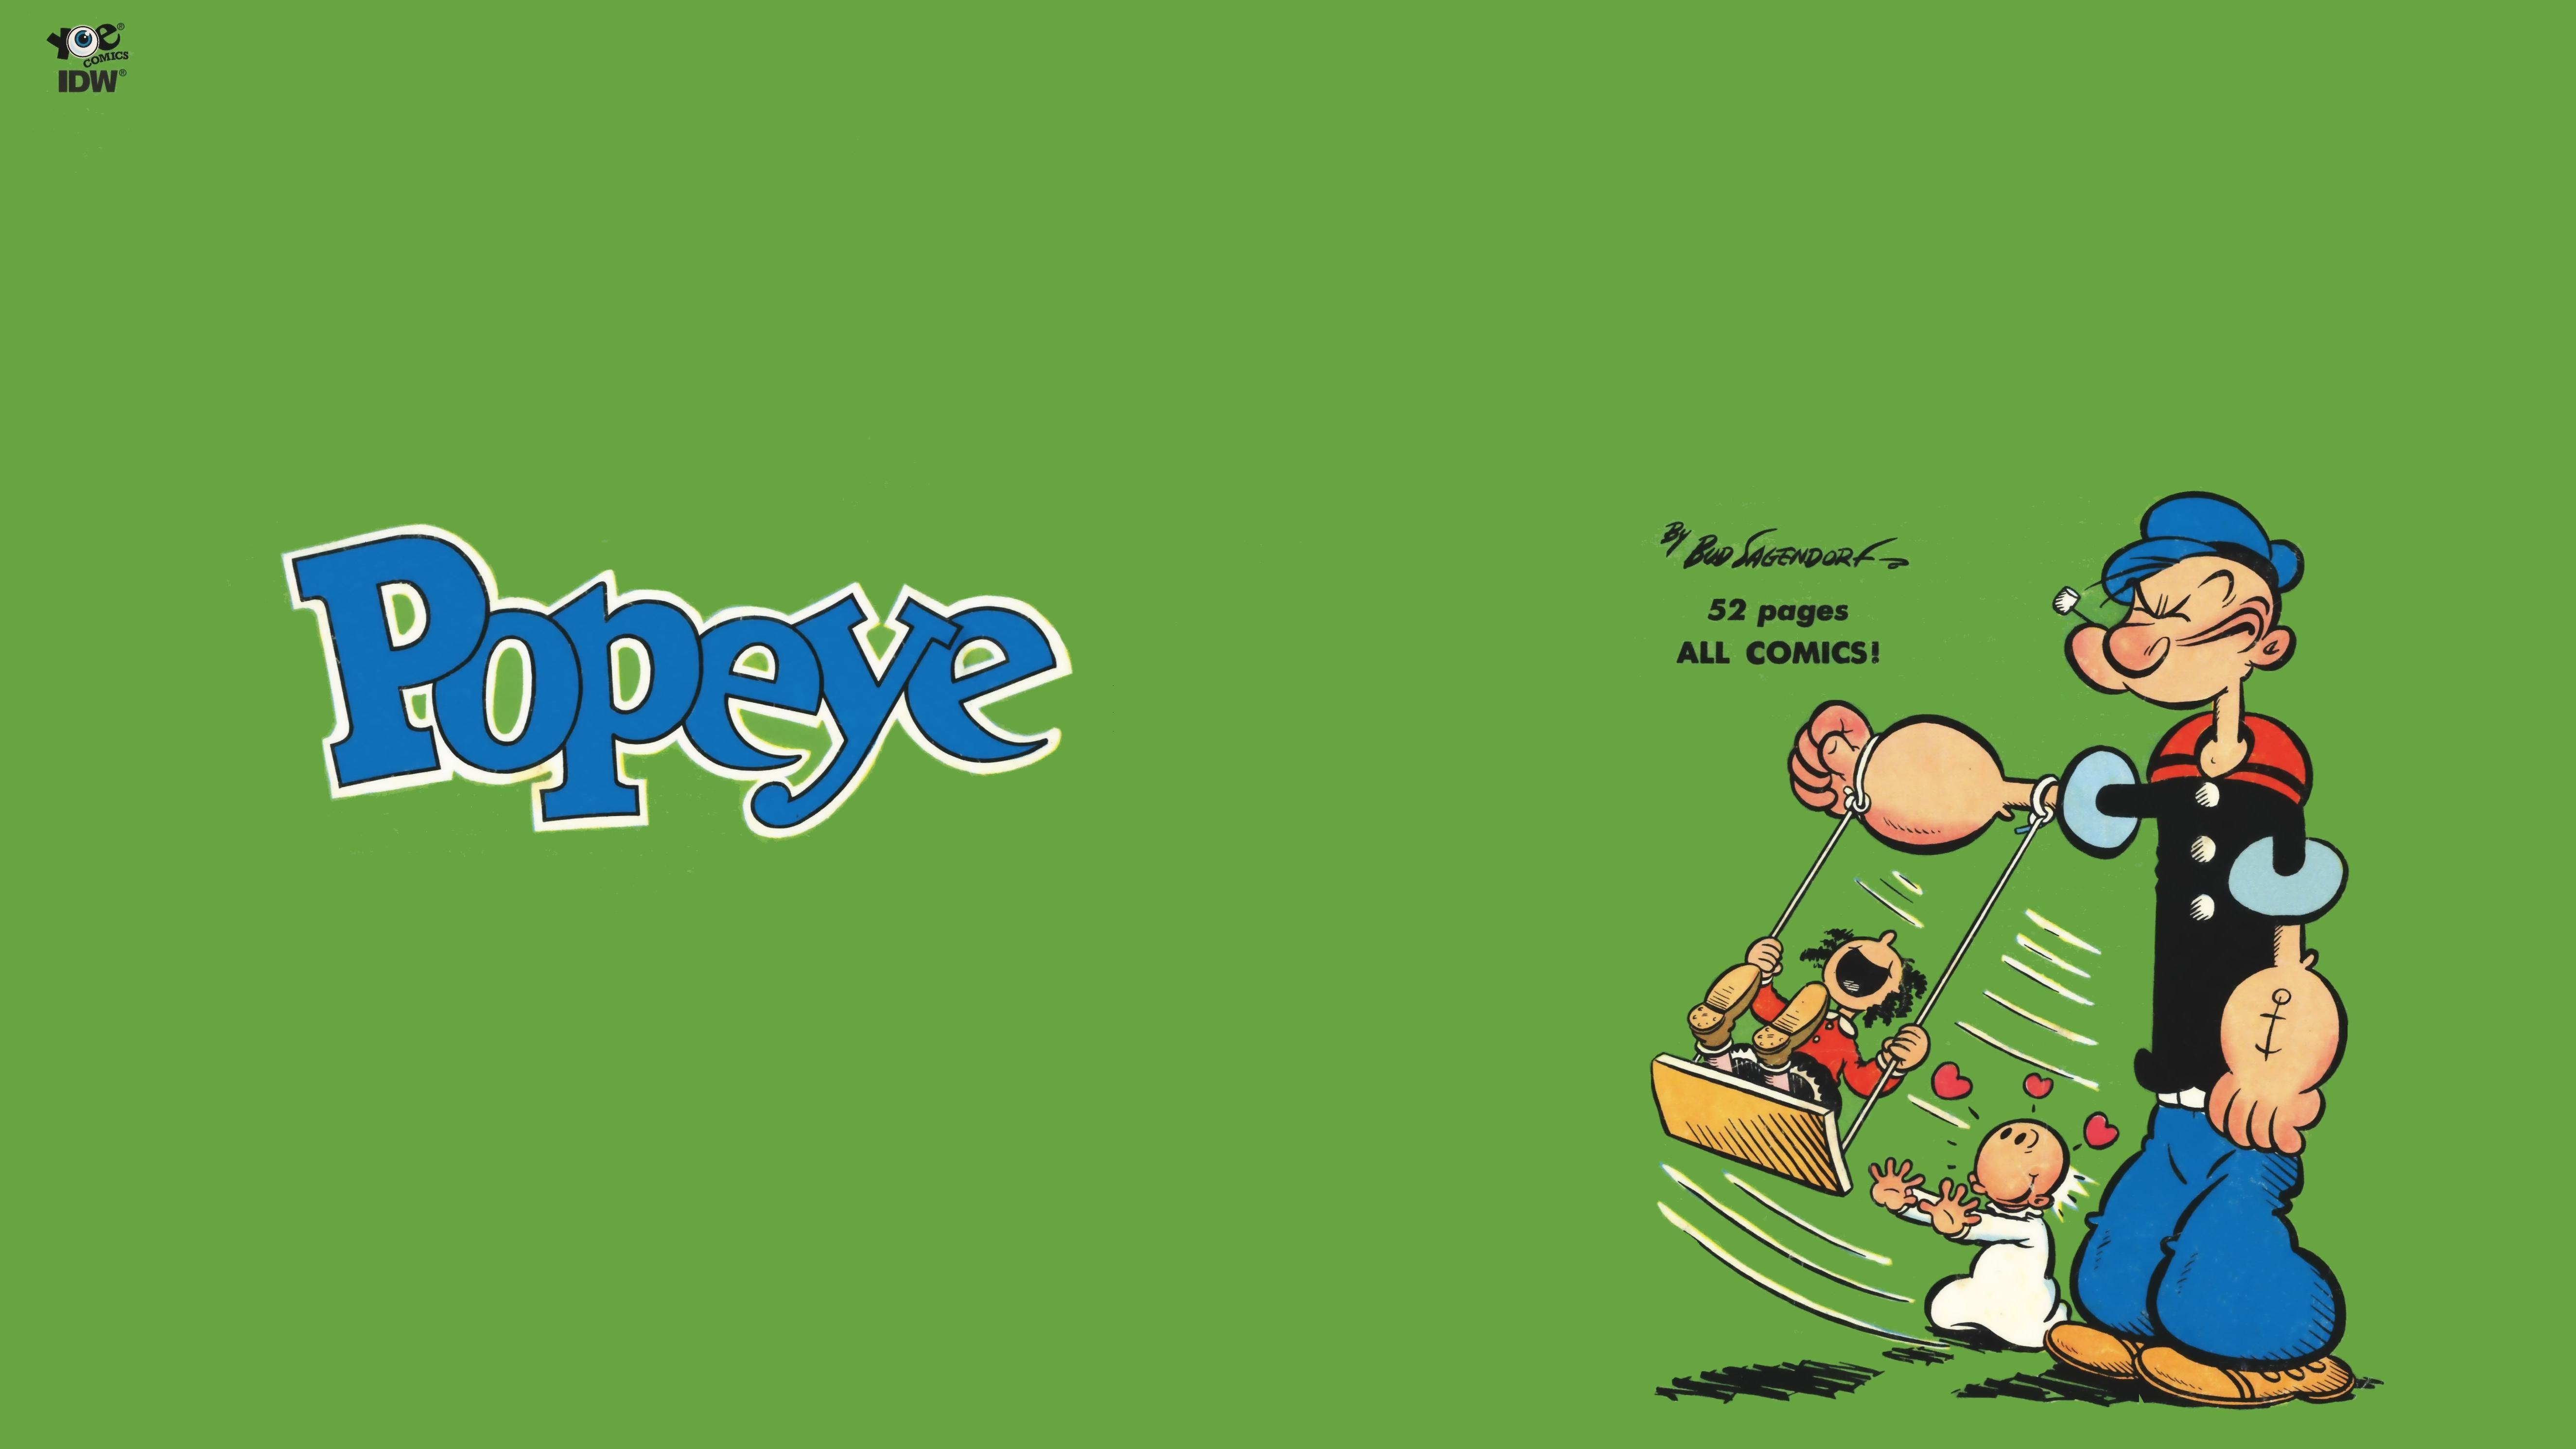 Popeye 5k Retina Ultra HD Wallpaper and Background Image ...